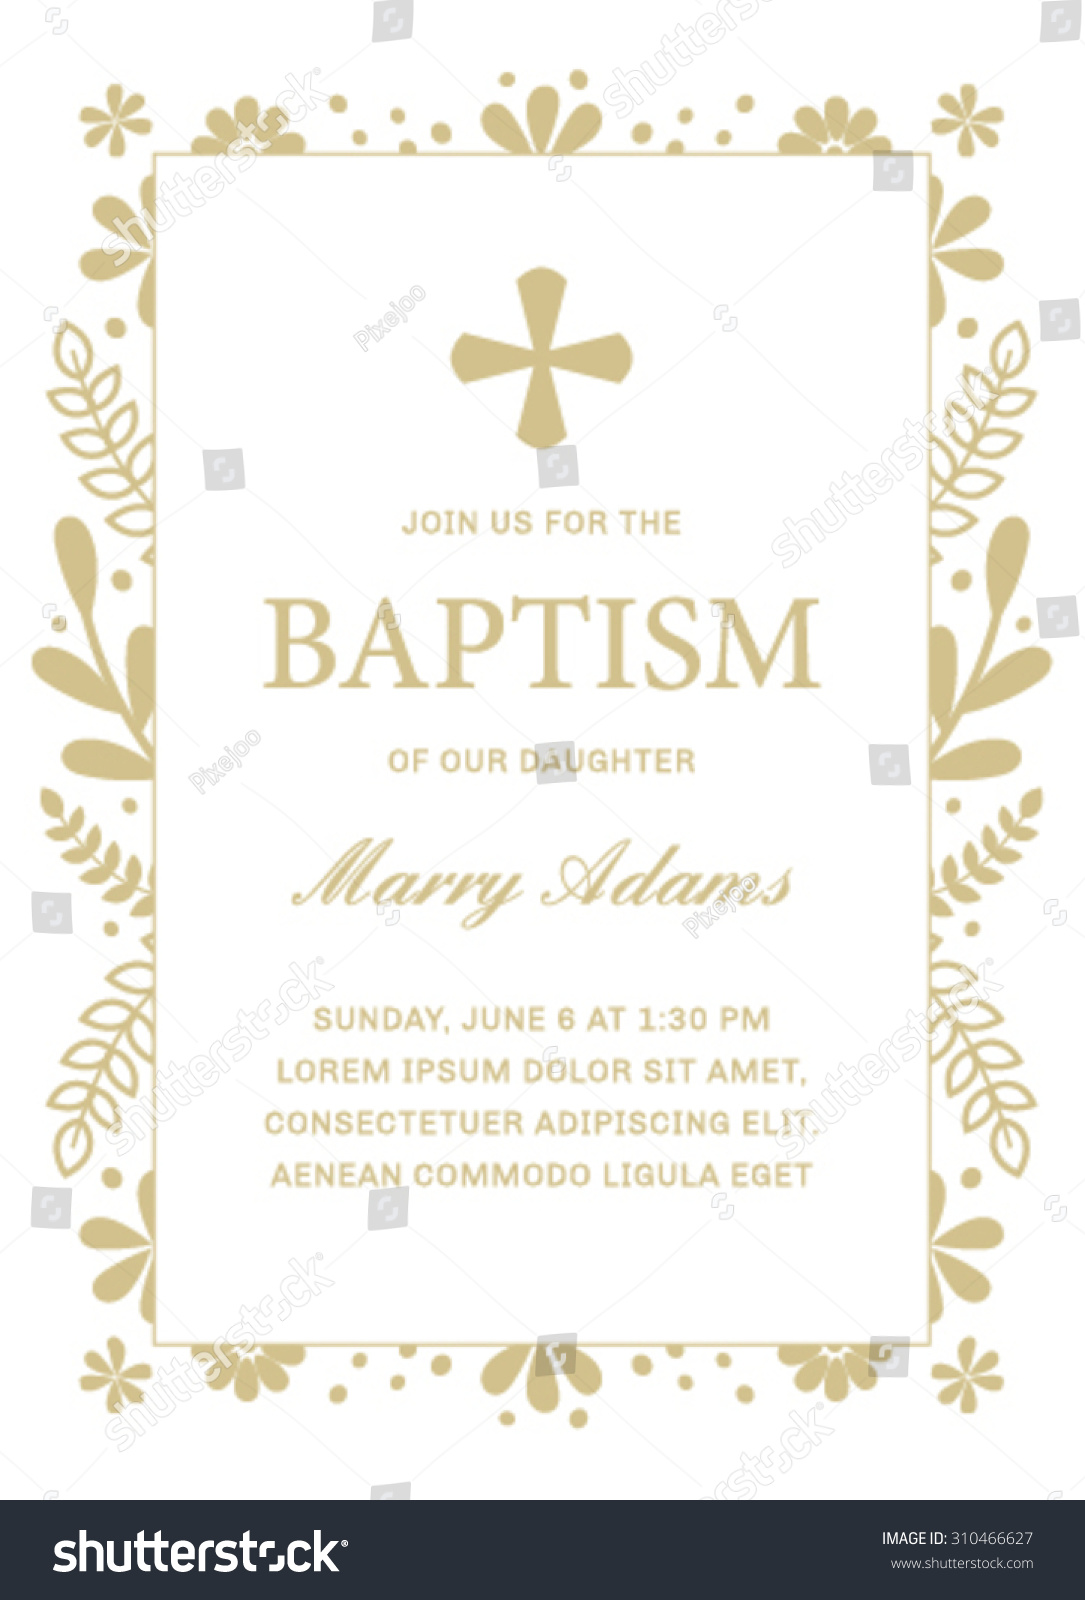 Baptism Template Floral Frame Stock Vector 310466627 - Shutterstock